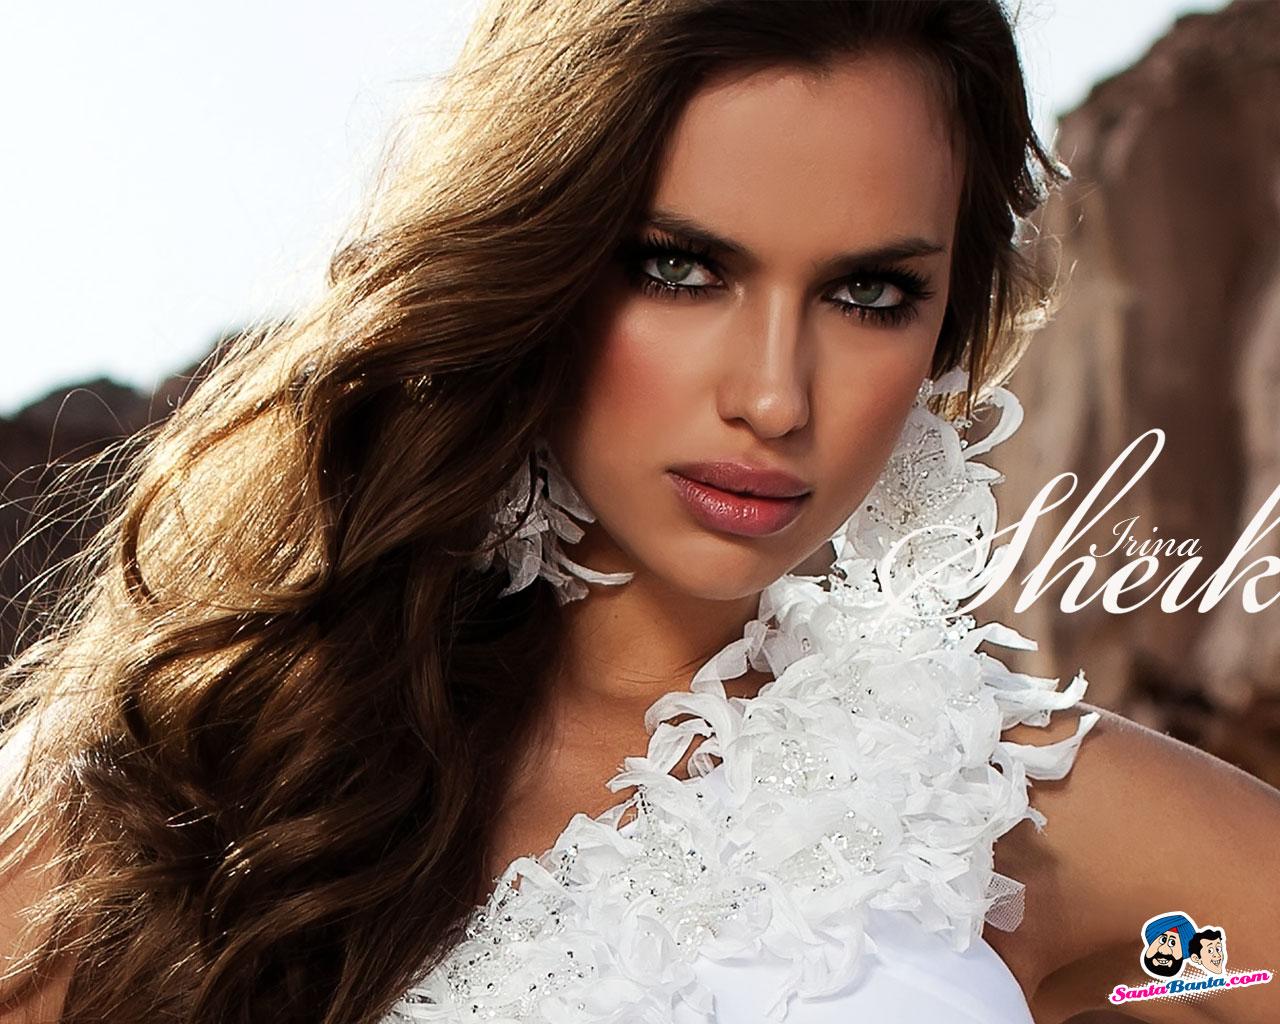 Irina Shayk Baggrunde - Baggrundeafari-3634